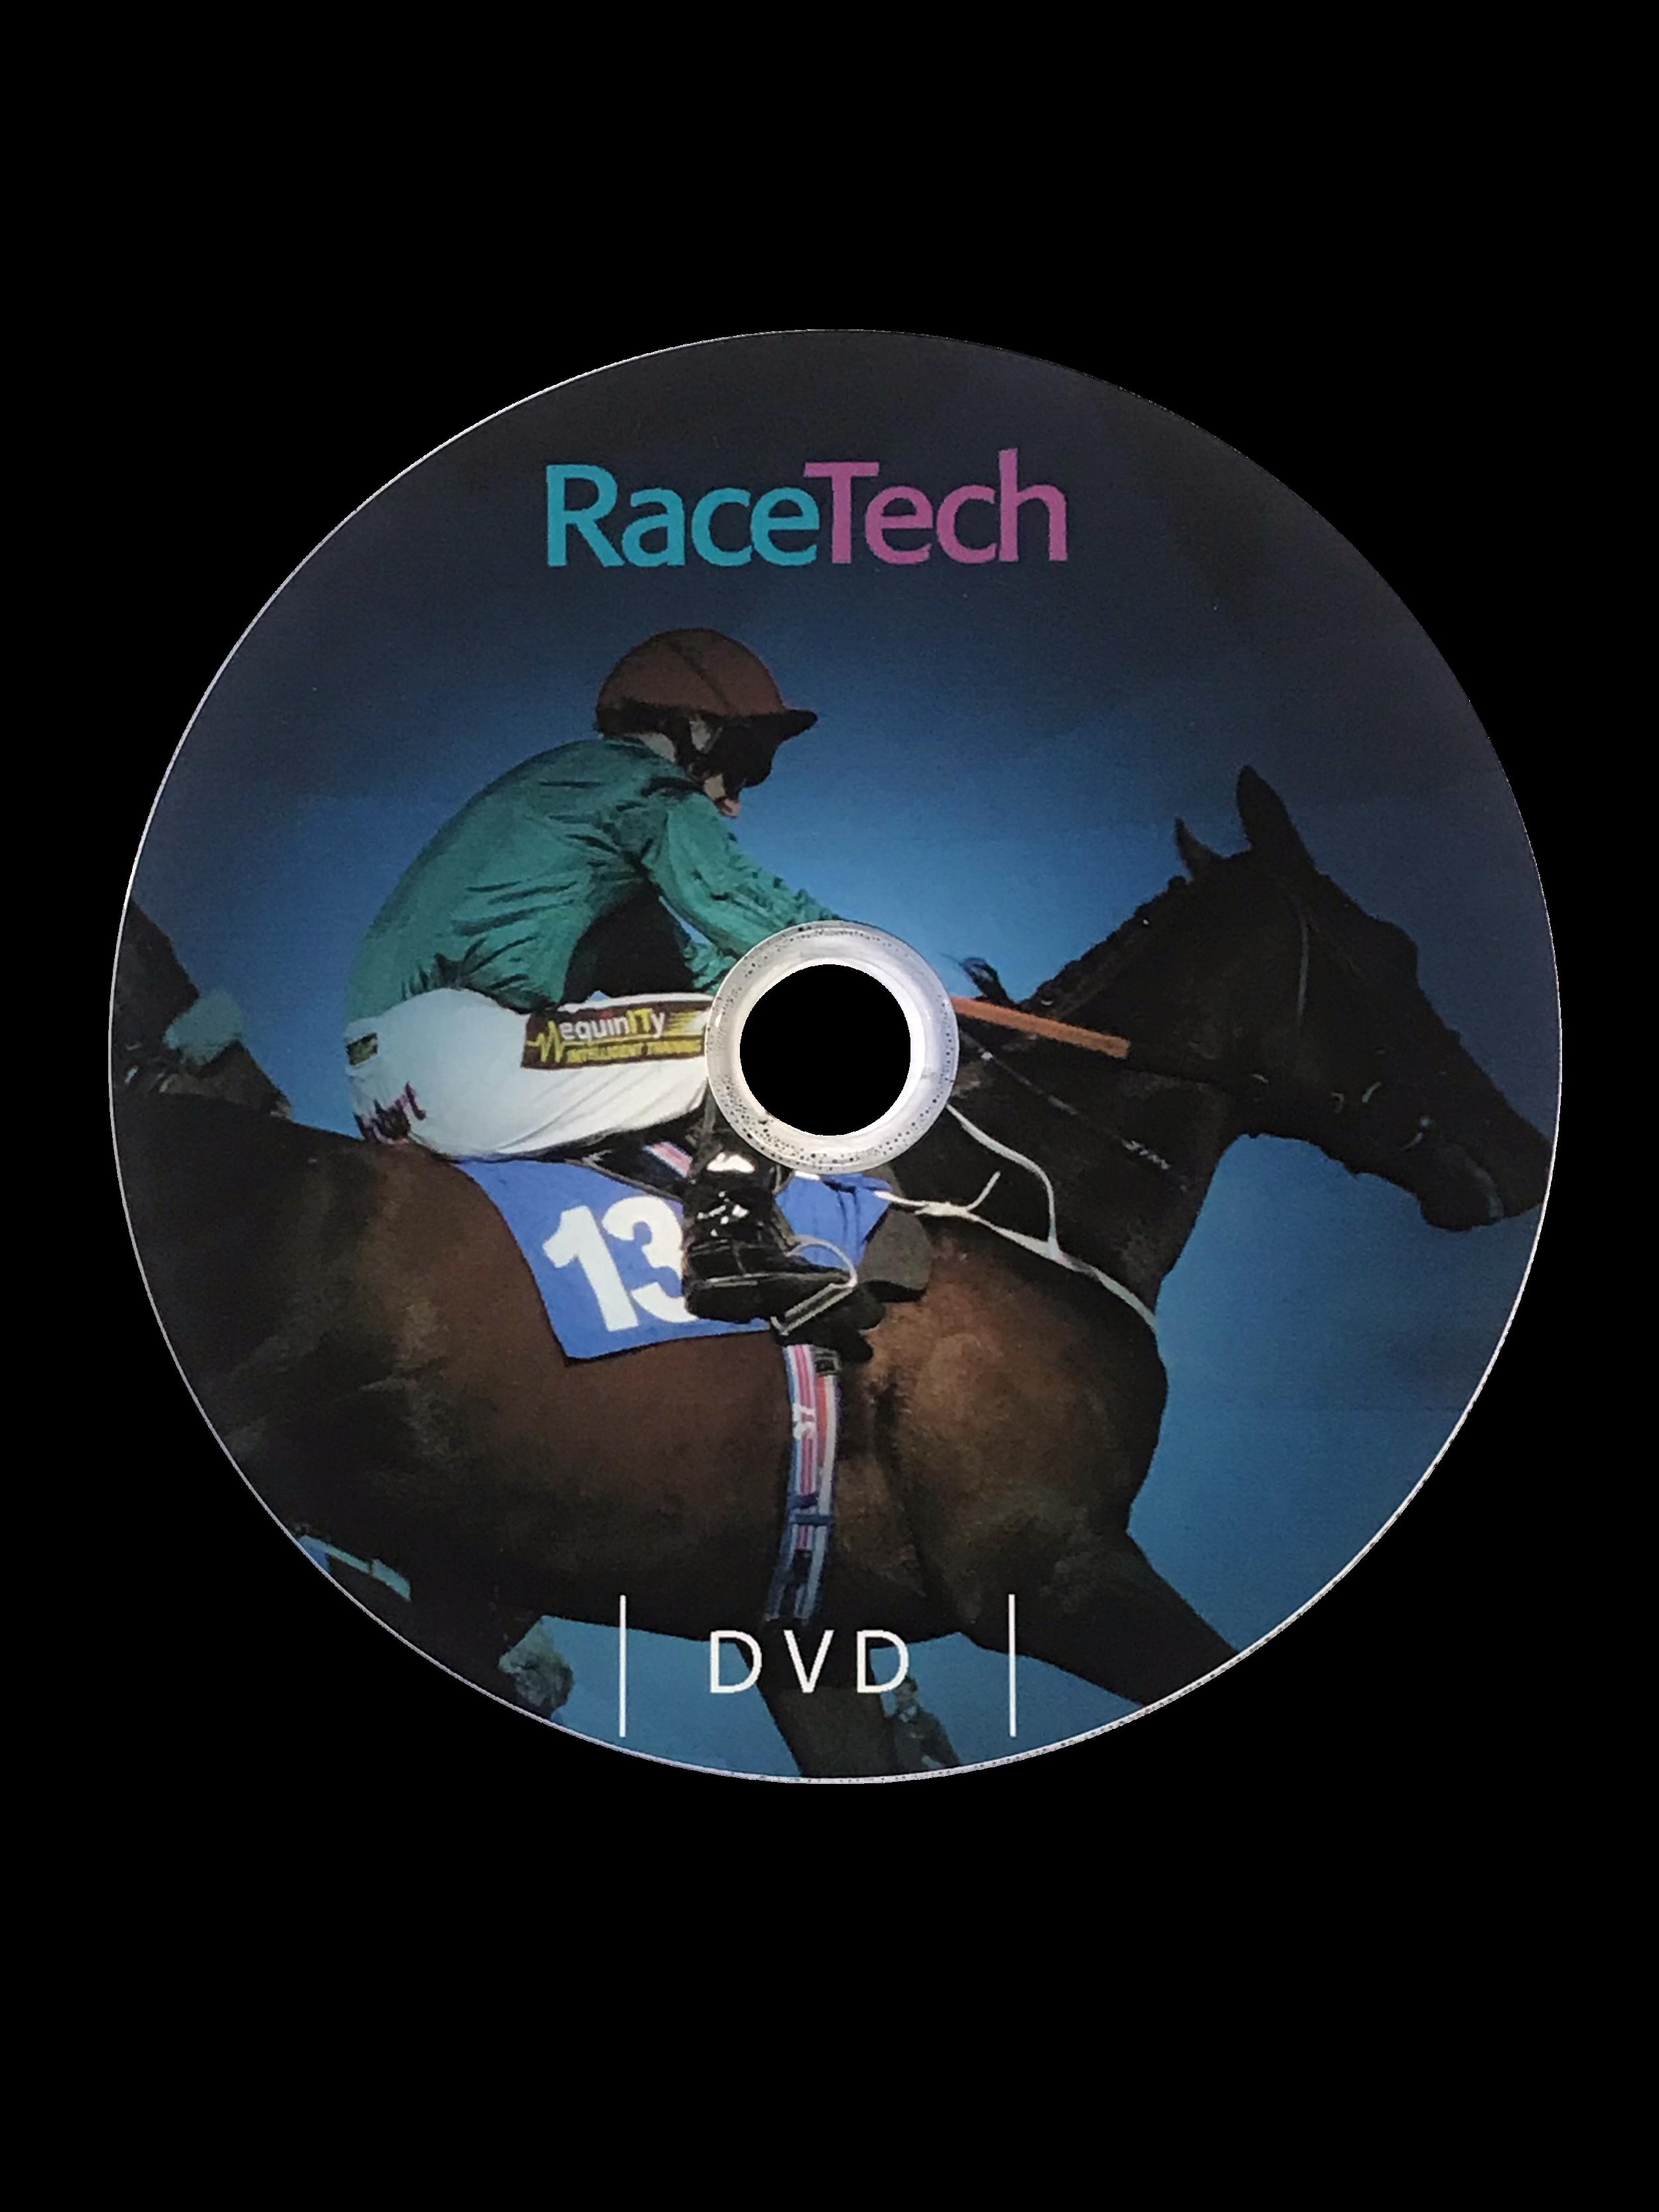 RaceTech DVD Disc.png